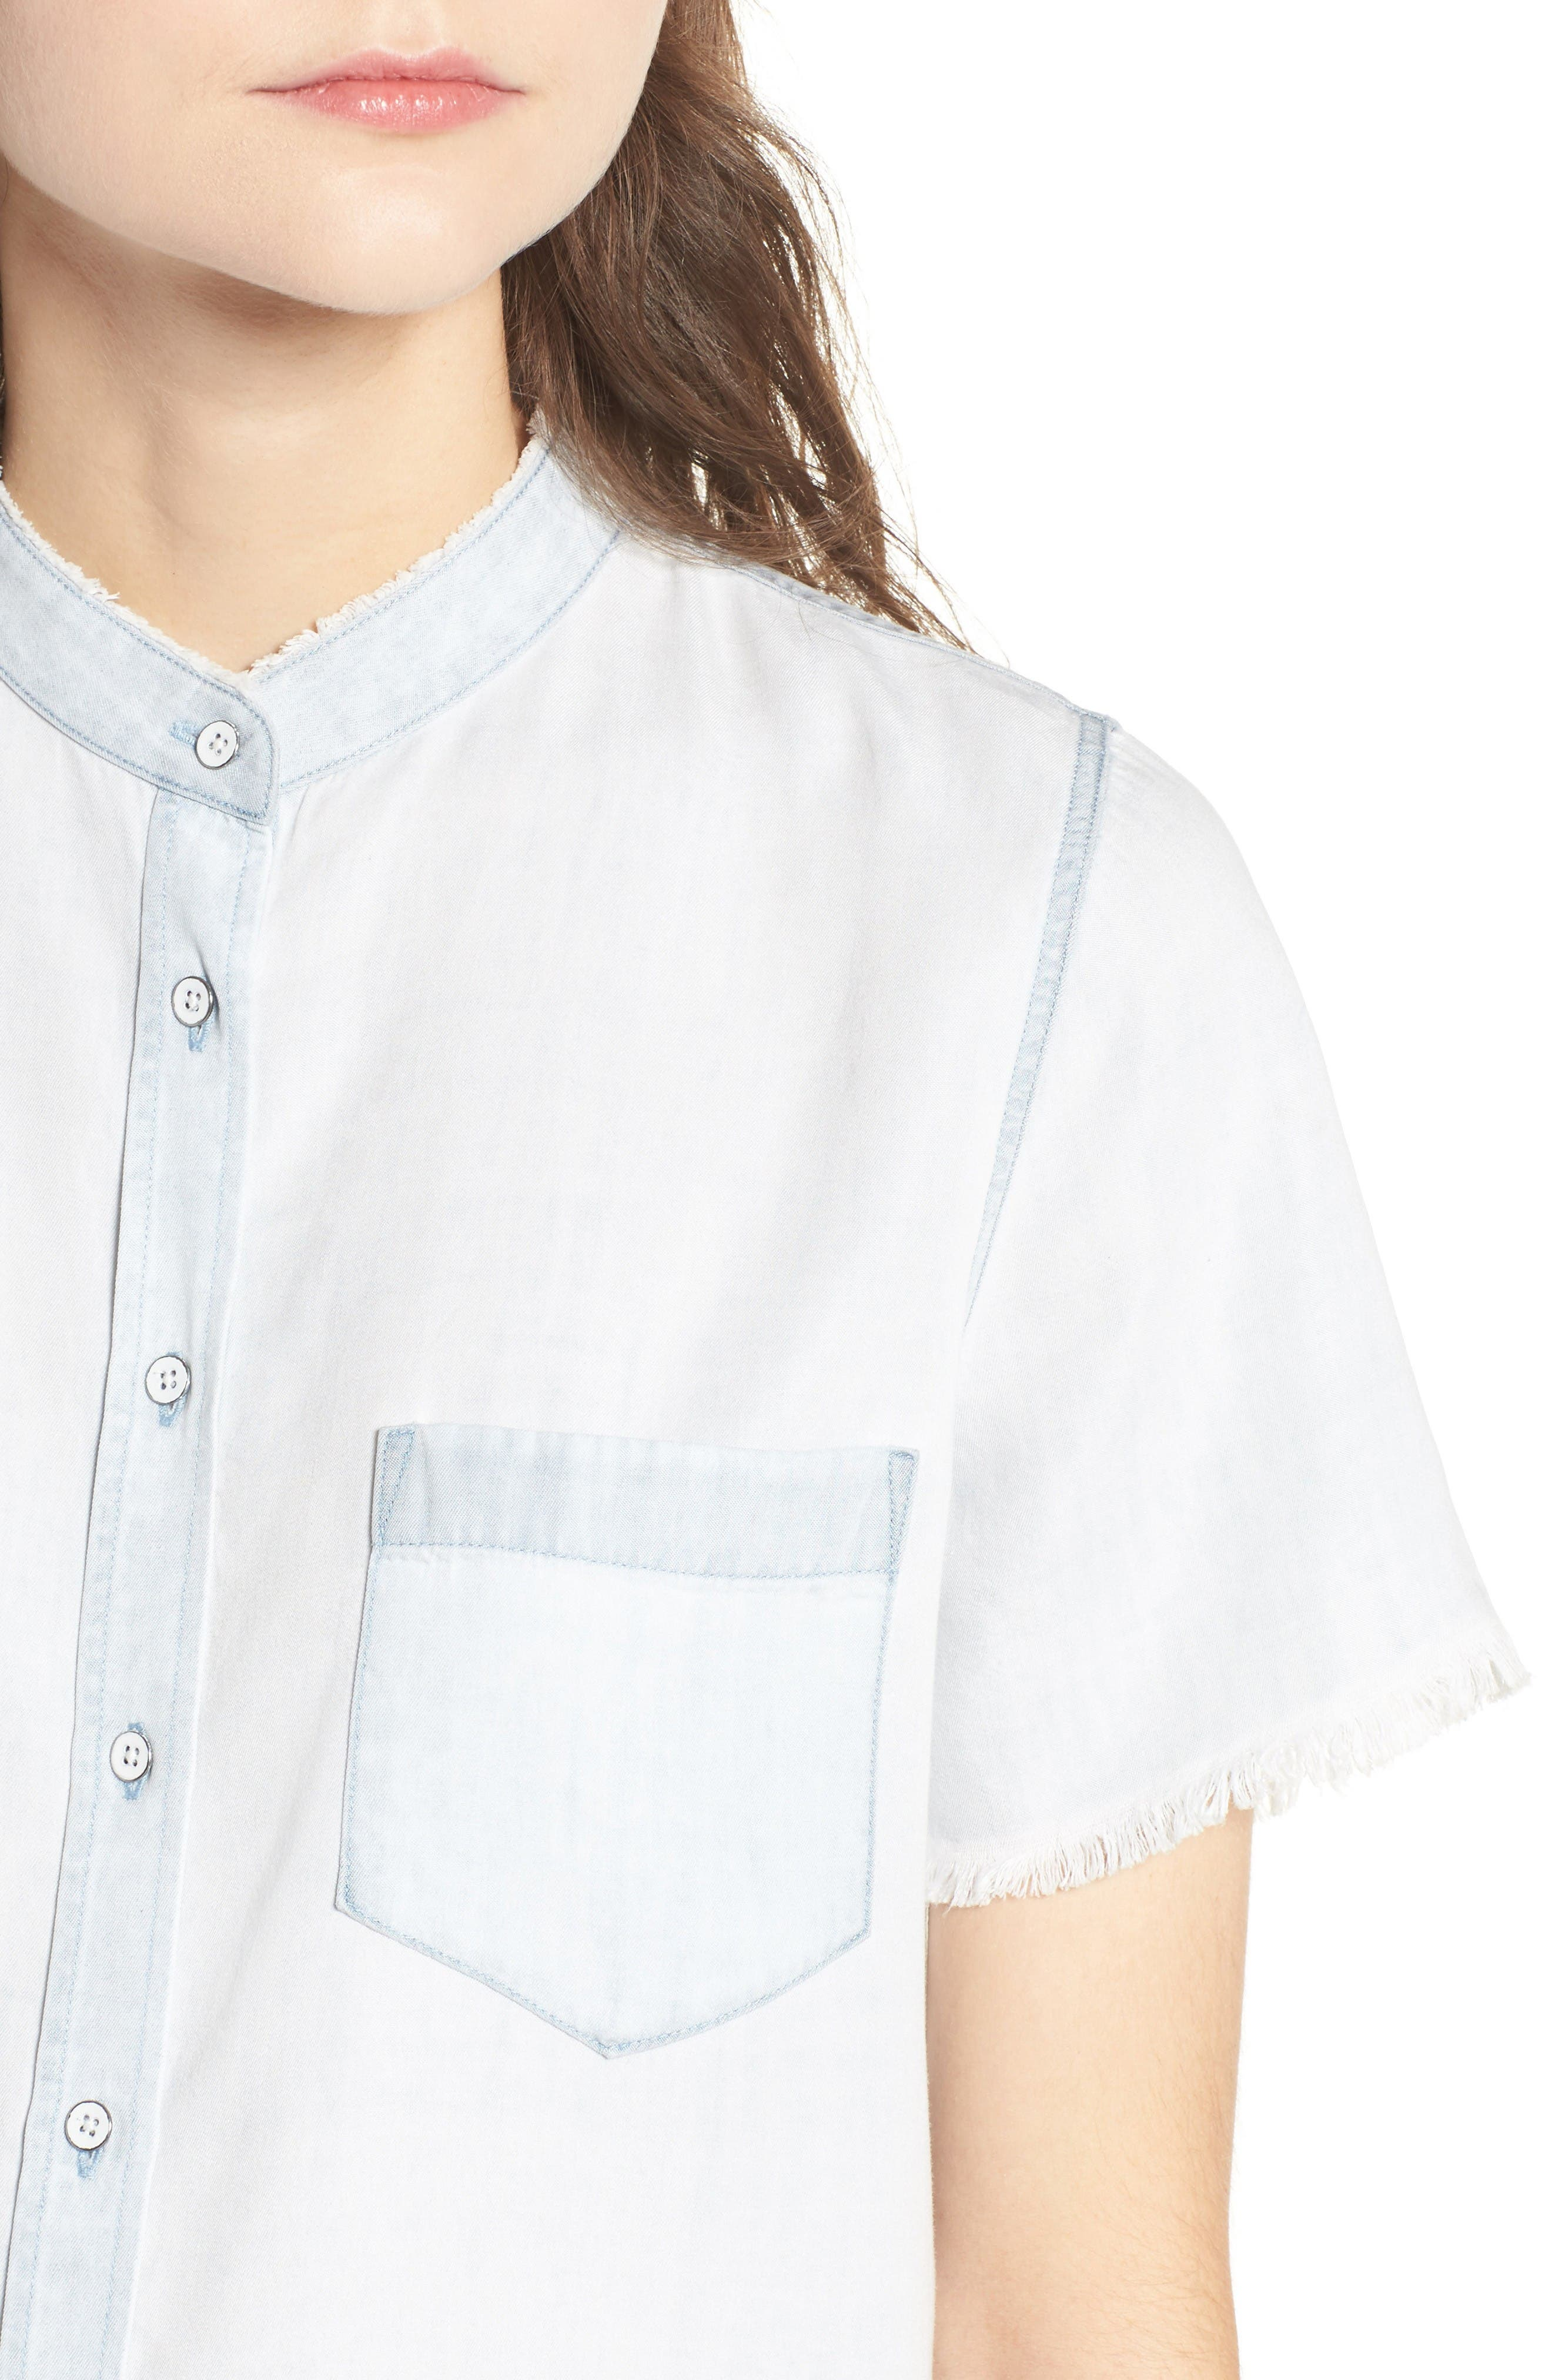 Montauk Shirt,                             Alternate thumbnail 4, color,                             Bleached